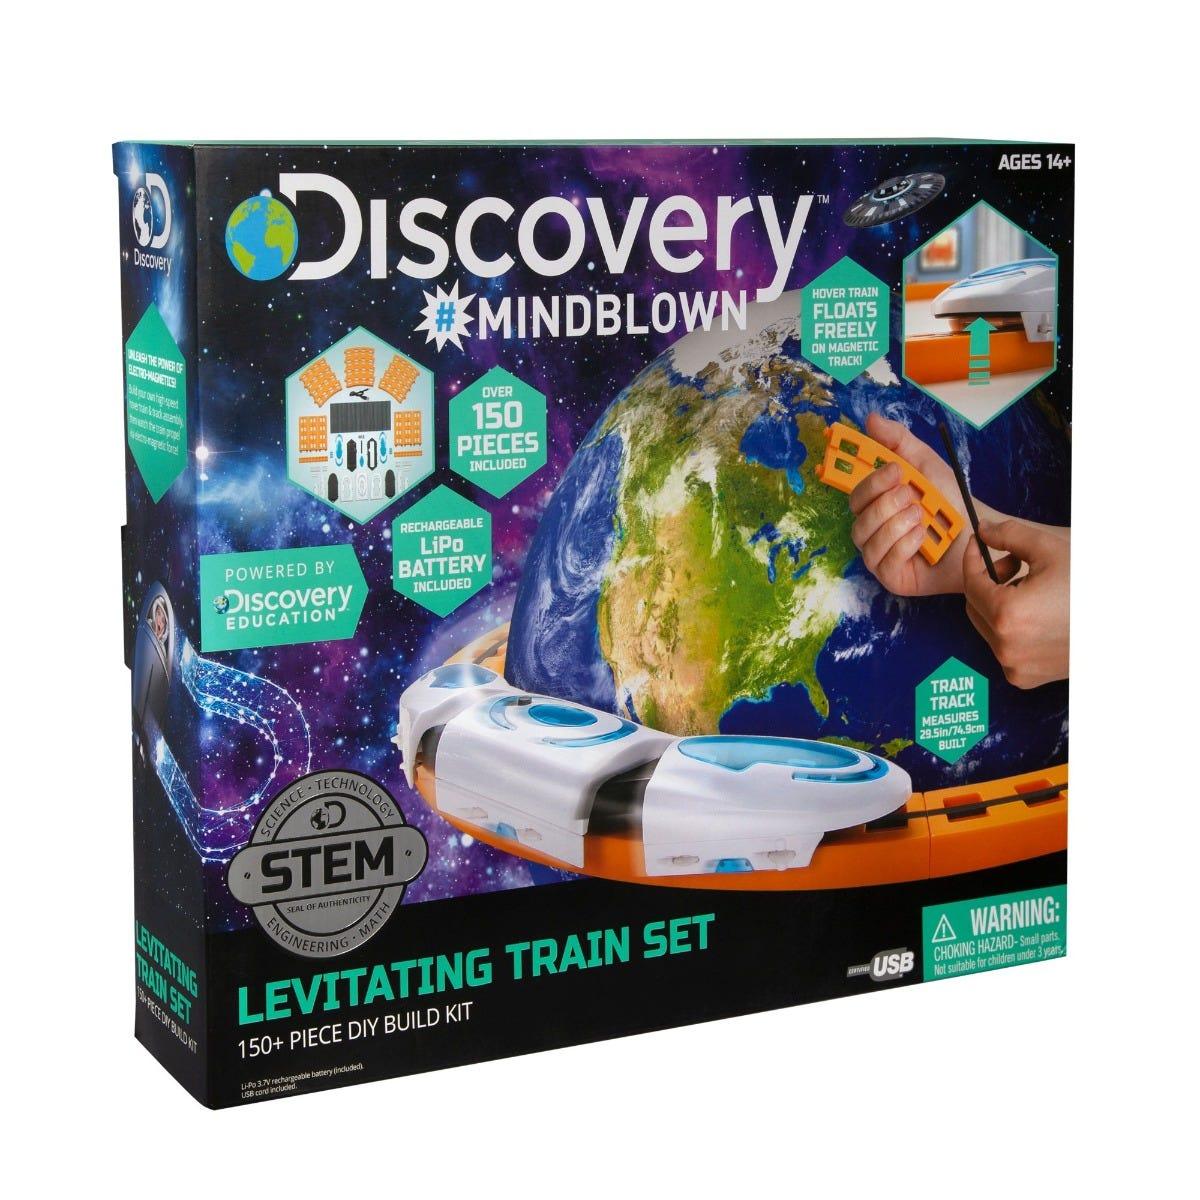 Tren magnético de juguete Discovery®